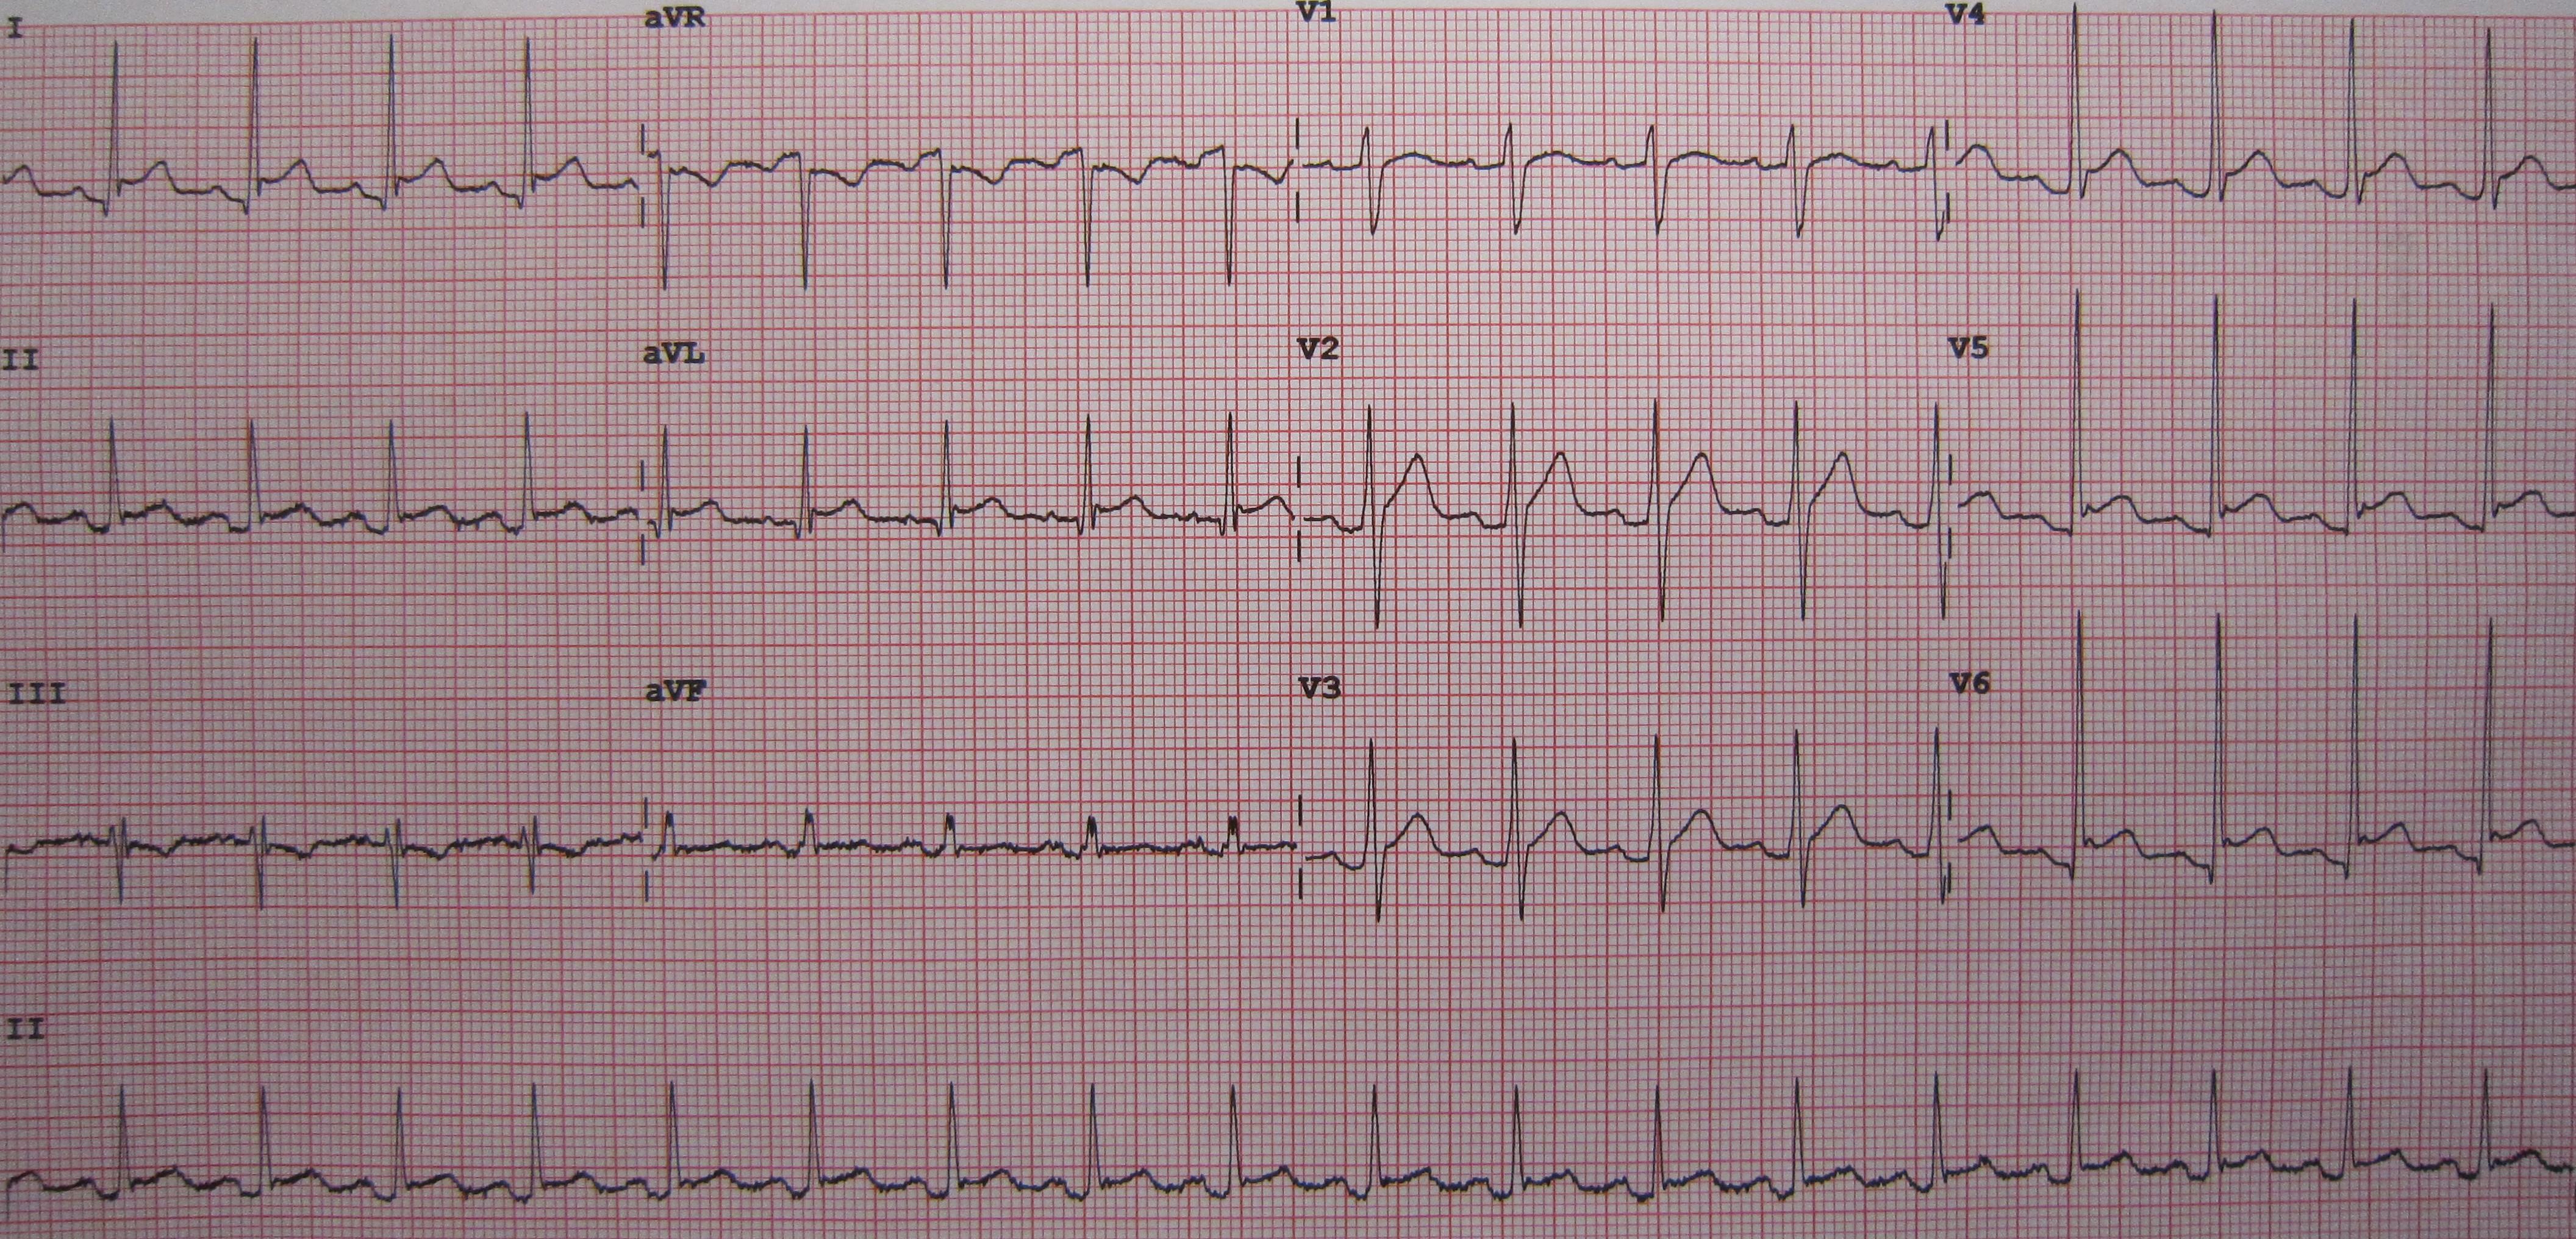 microcardia symptoms